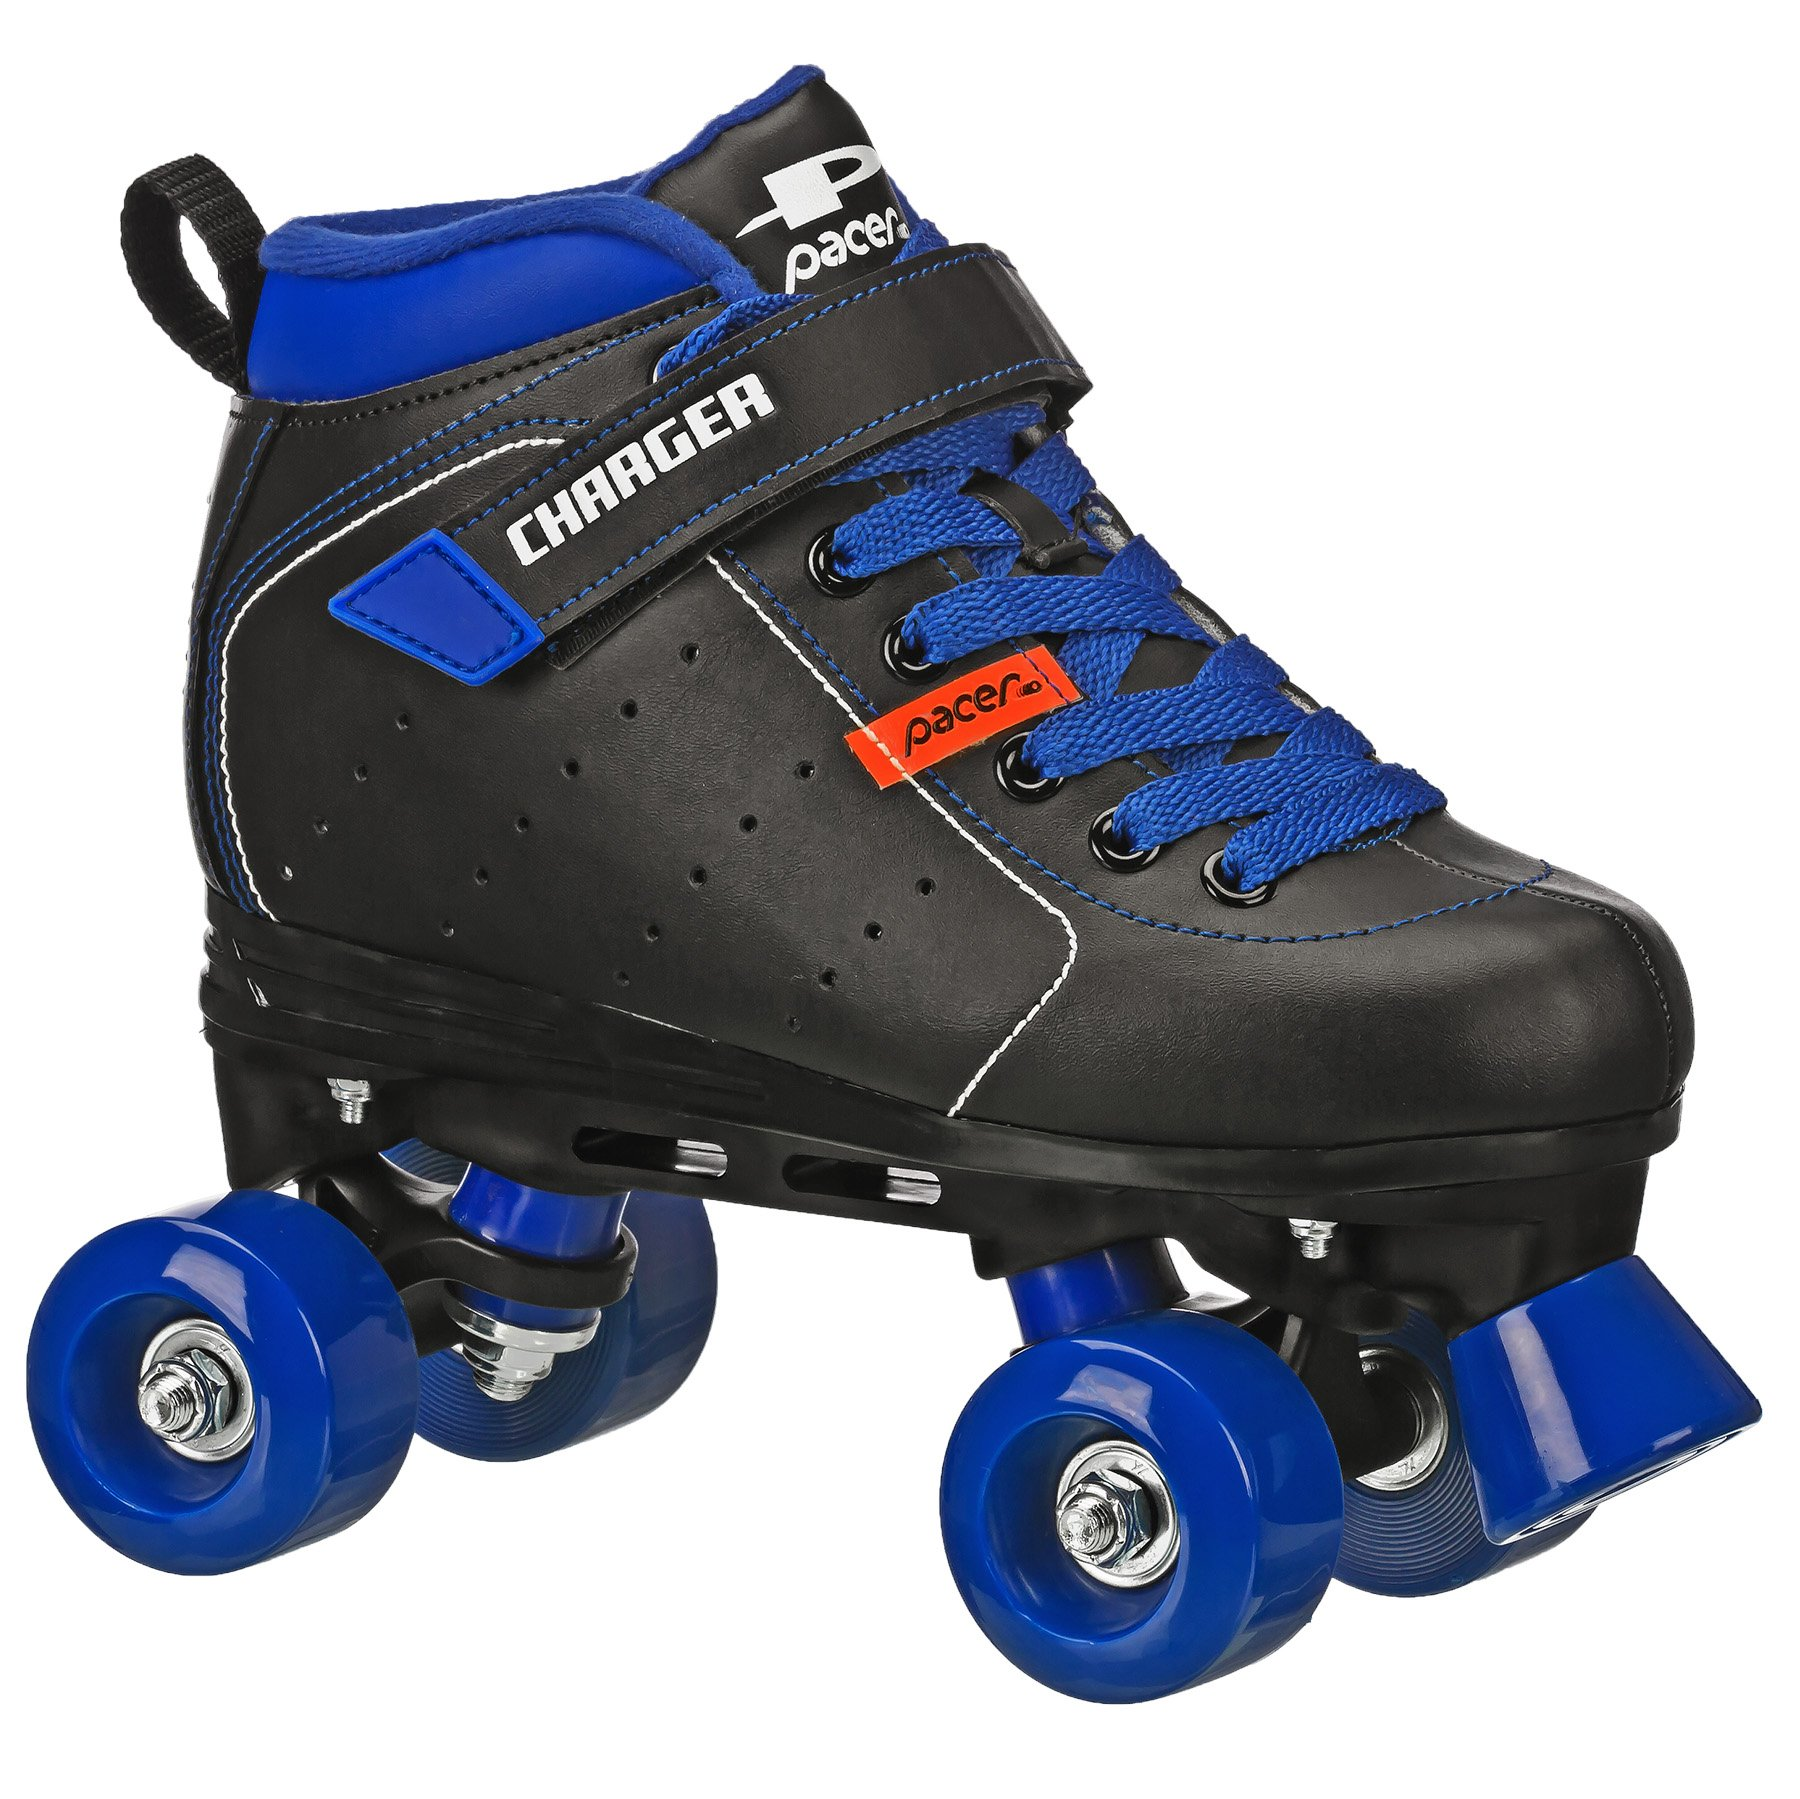 Pacer Charger Quad Roller Skate from Roller Derby